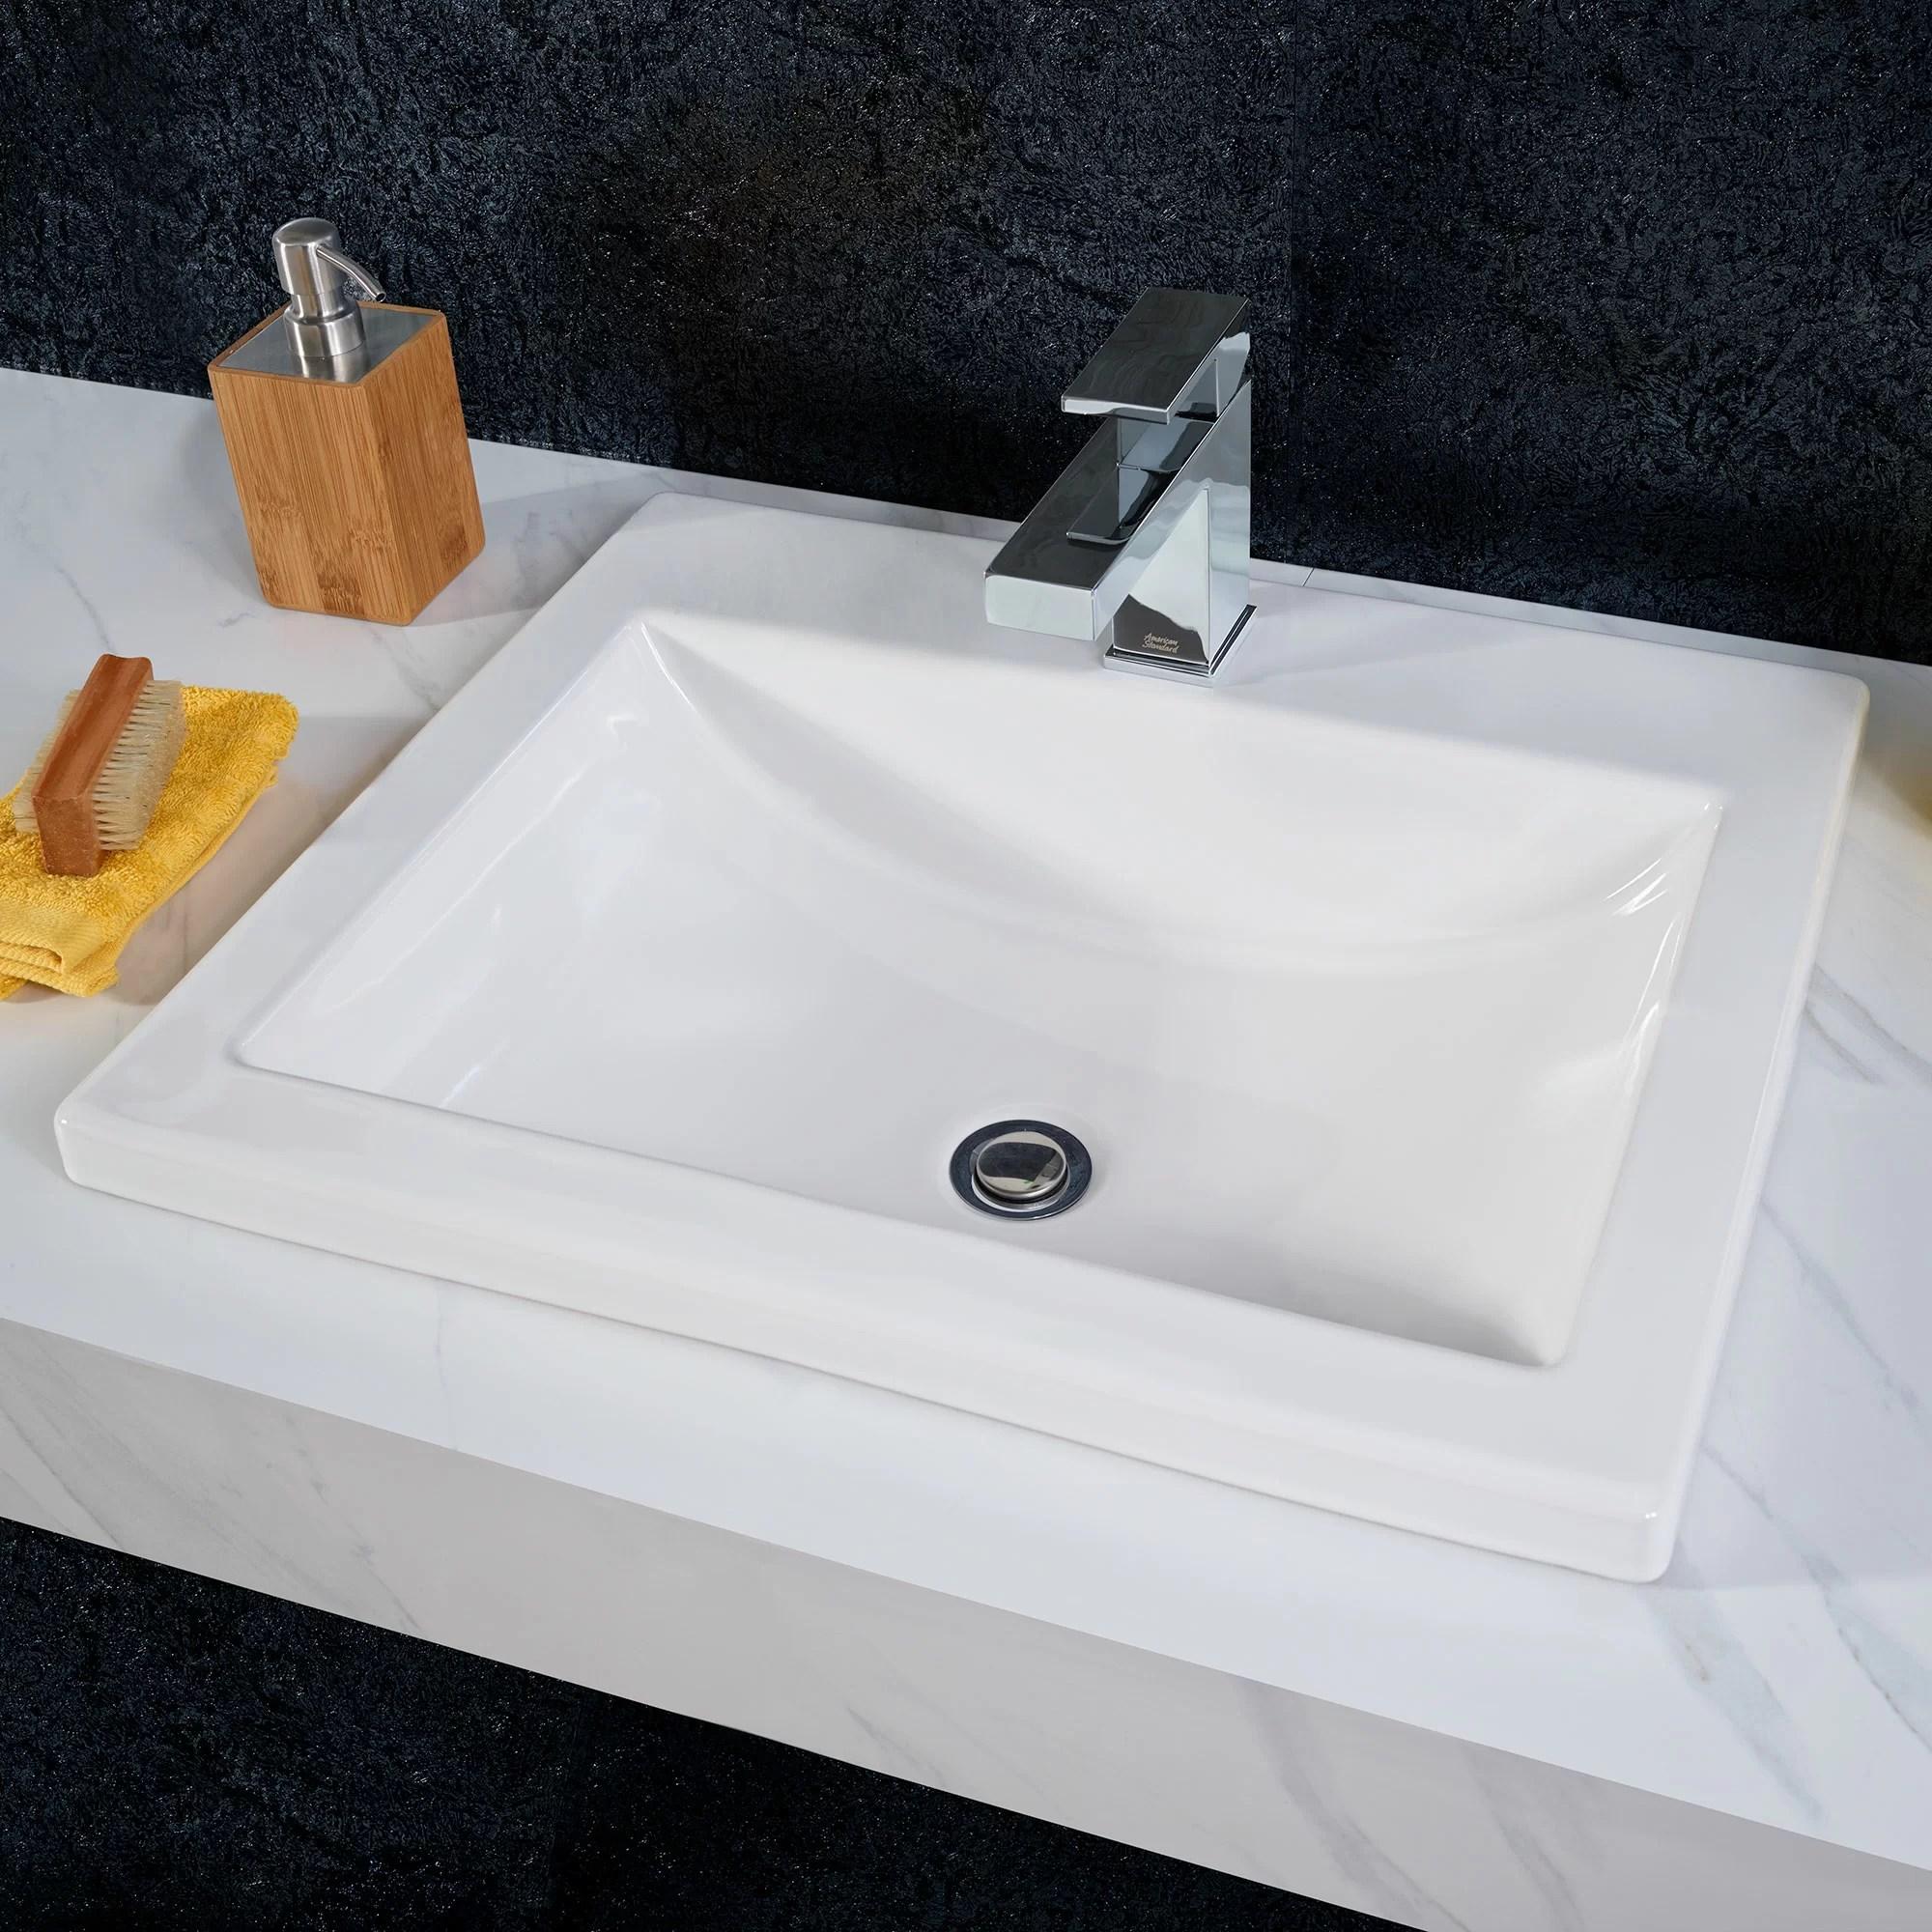 studio vitreous china rectangular drop in bathroom sink with overflow